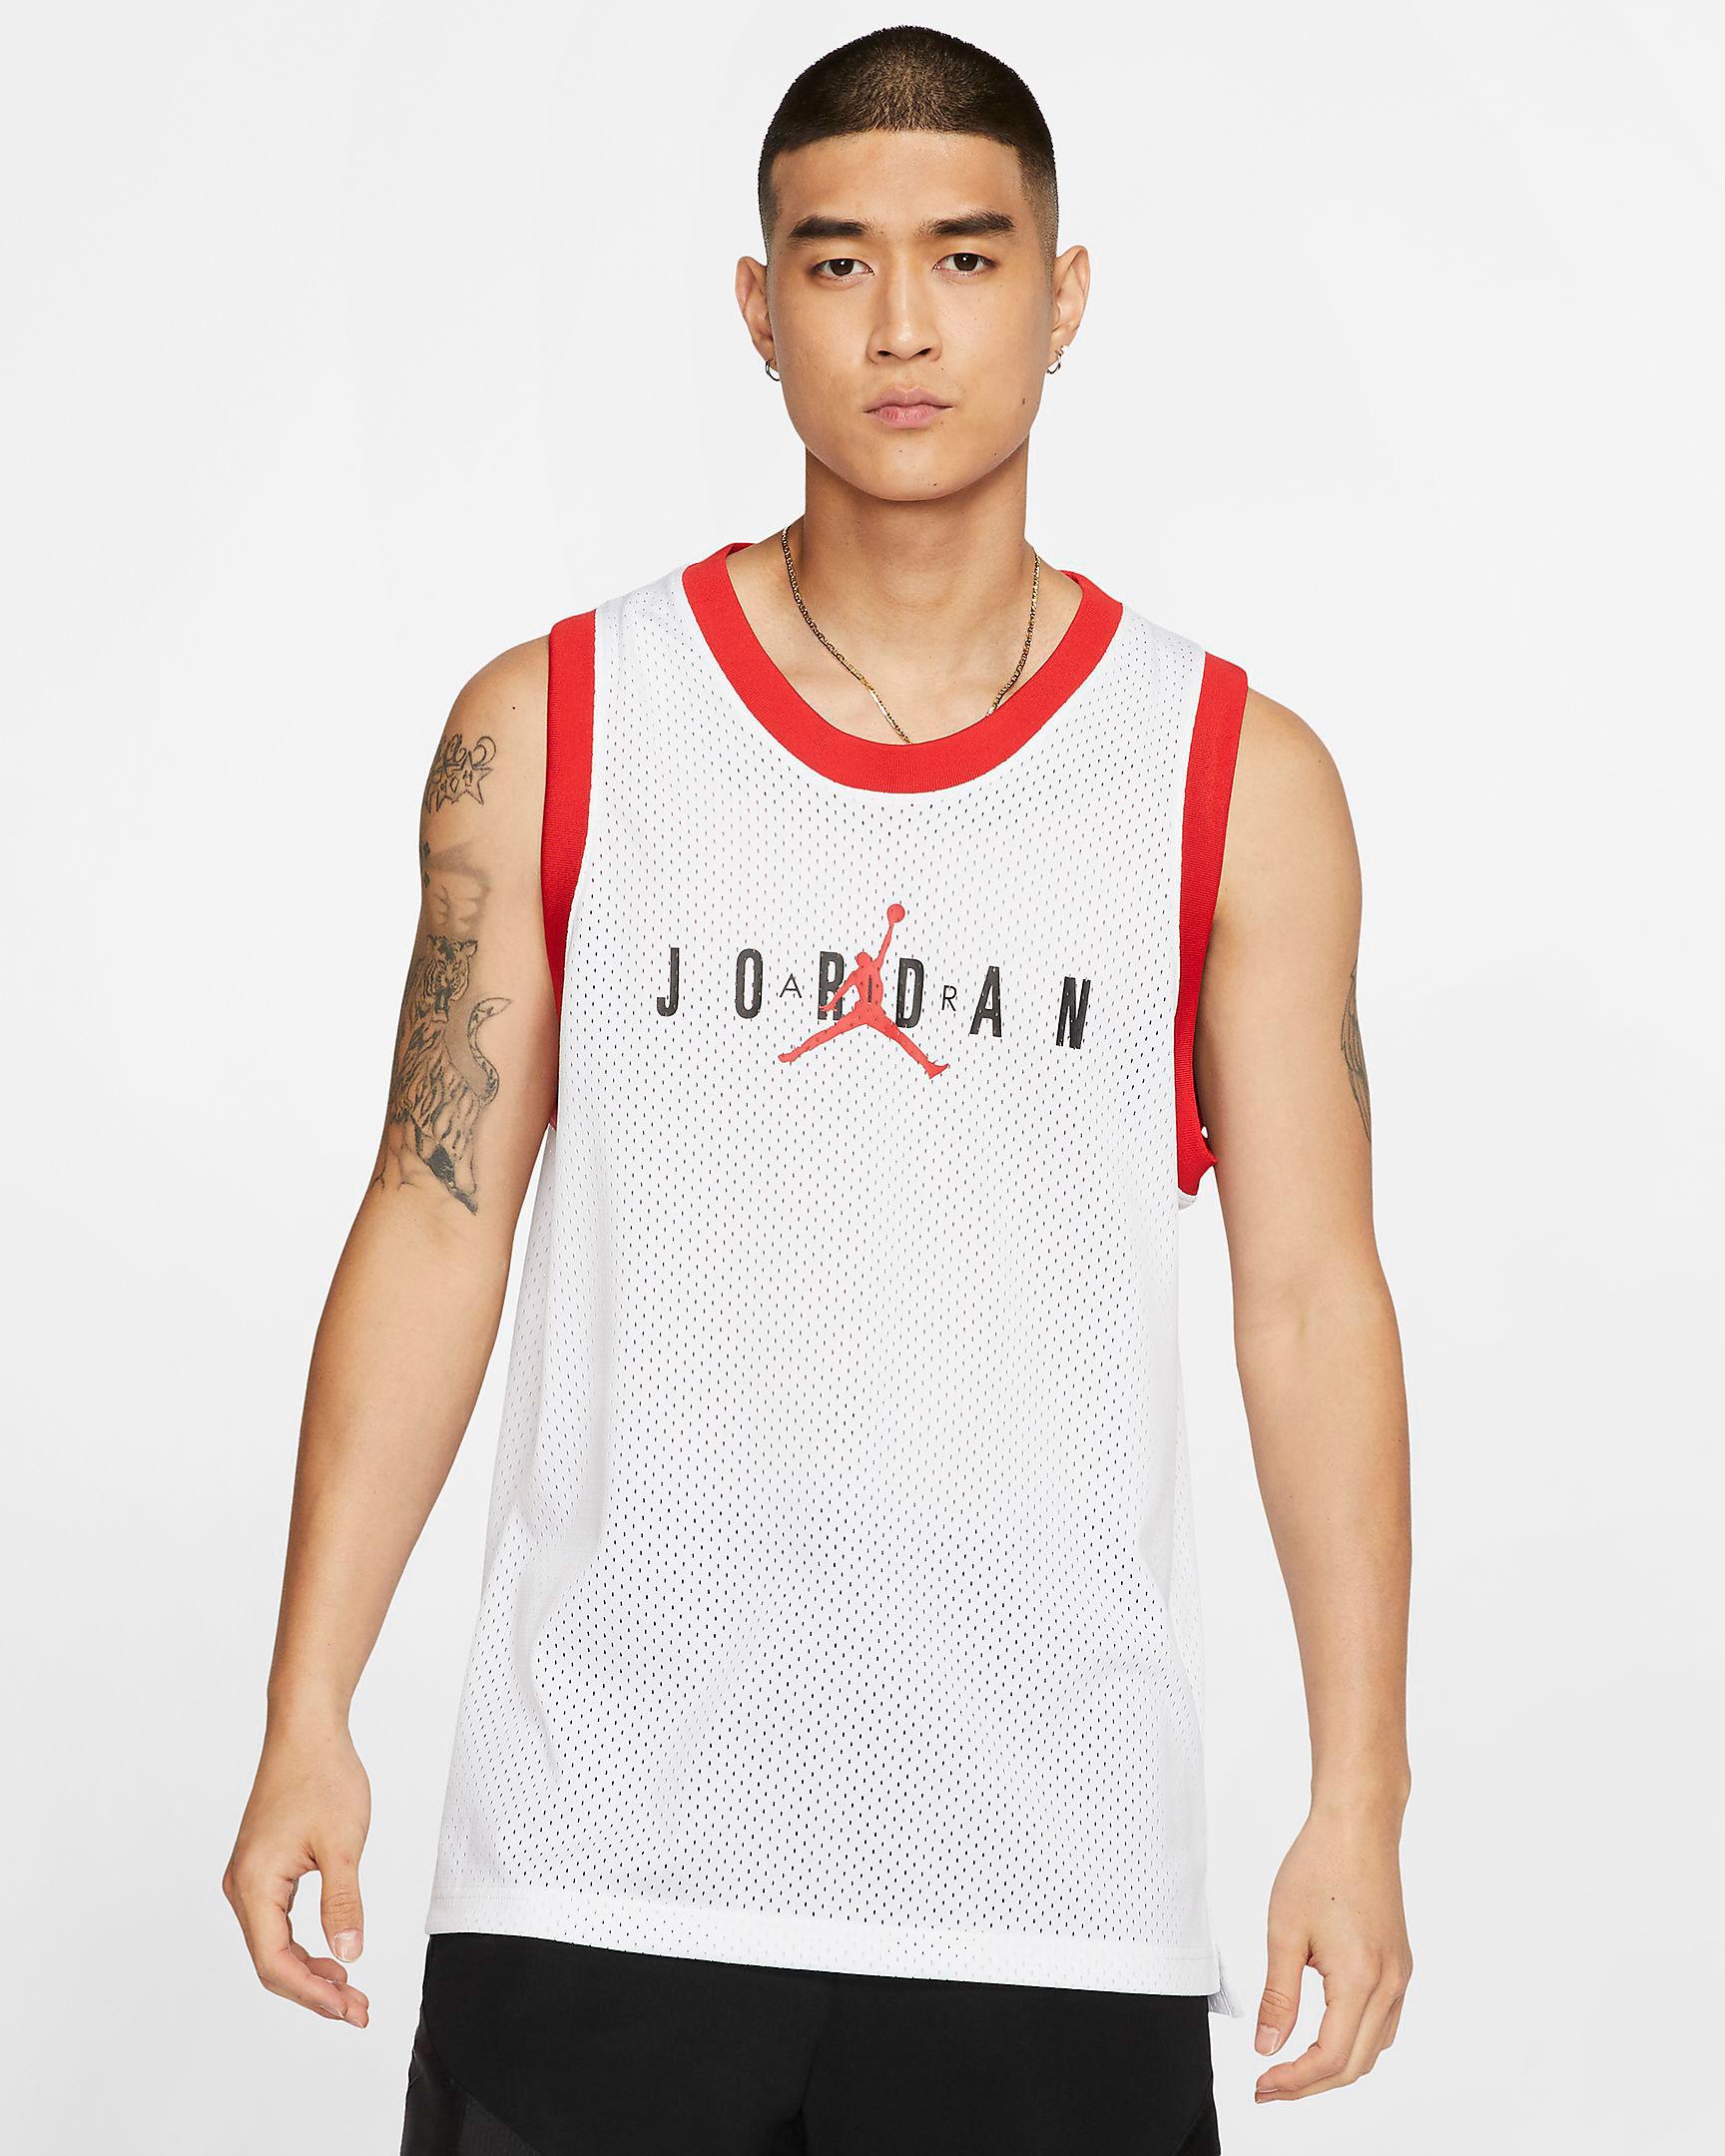 jordan-sport-dna-jersey-white-red